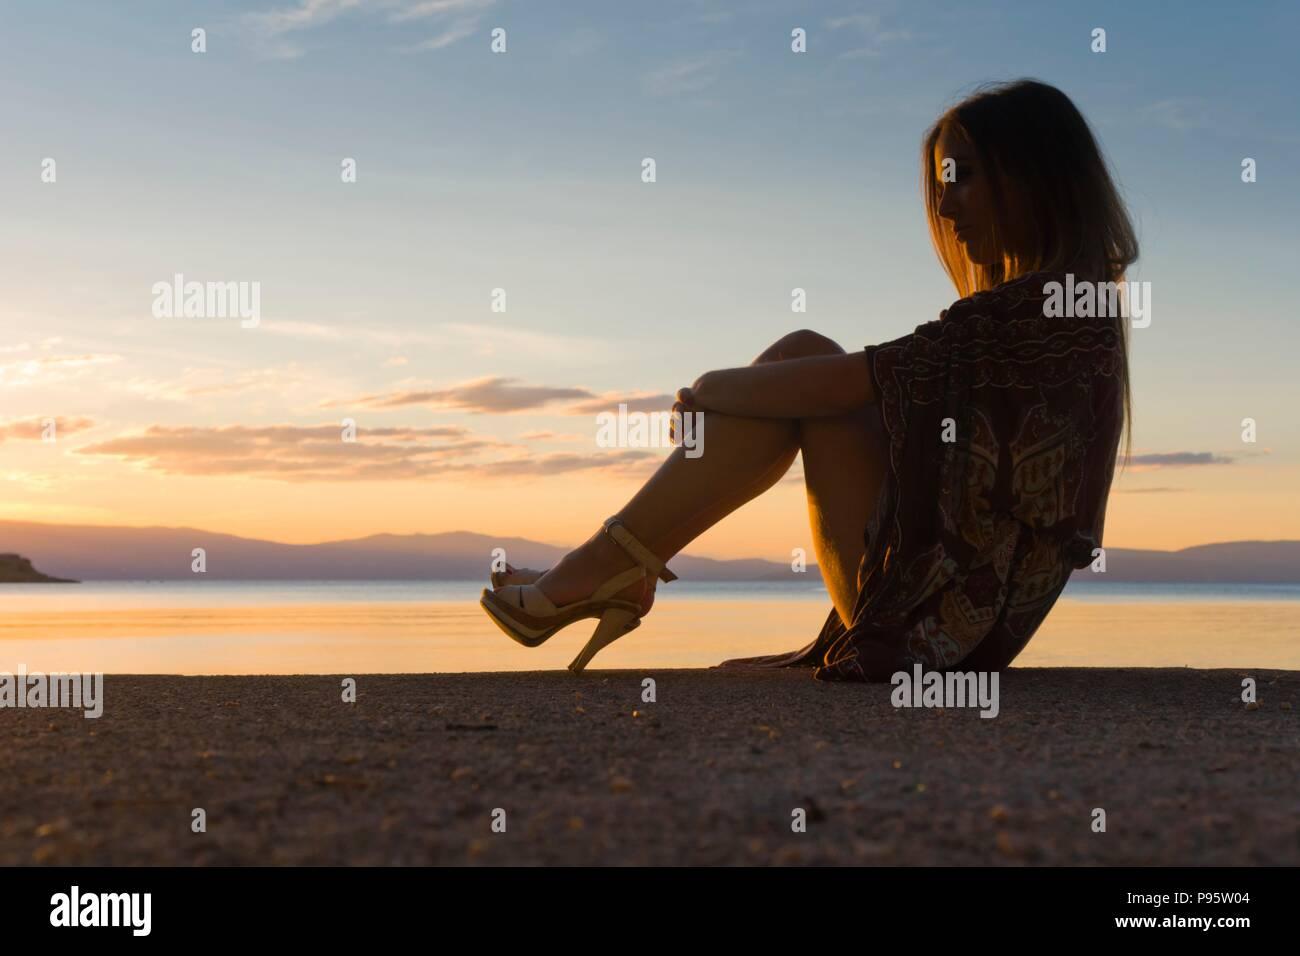 Heelsaddiced heelsaddict young woman person on seaside near sea in evening sunset time romantic serenity warm low light horizon island MR Stock Photo